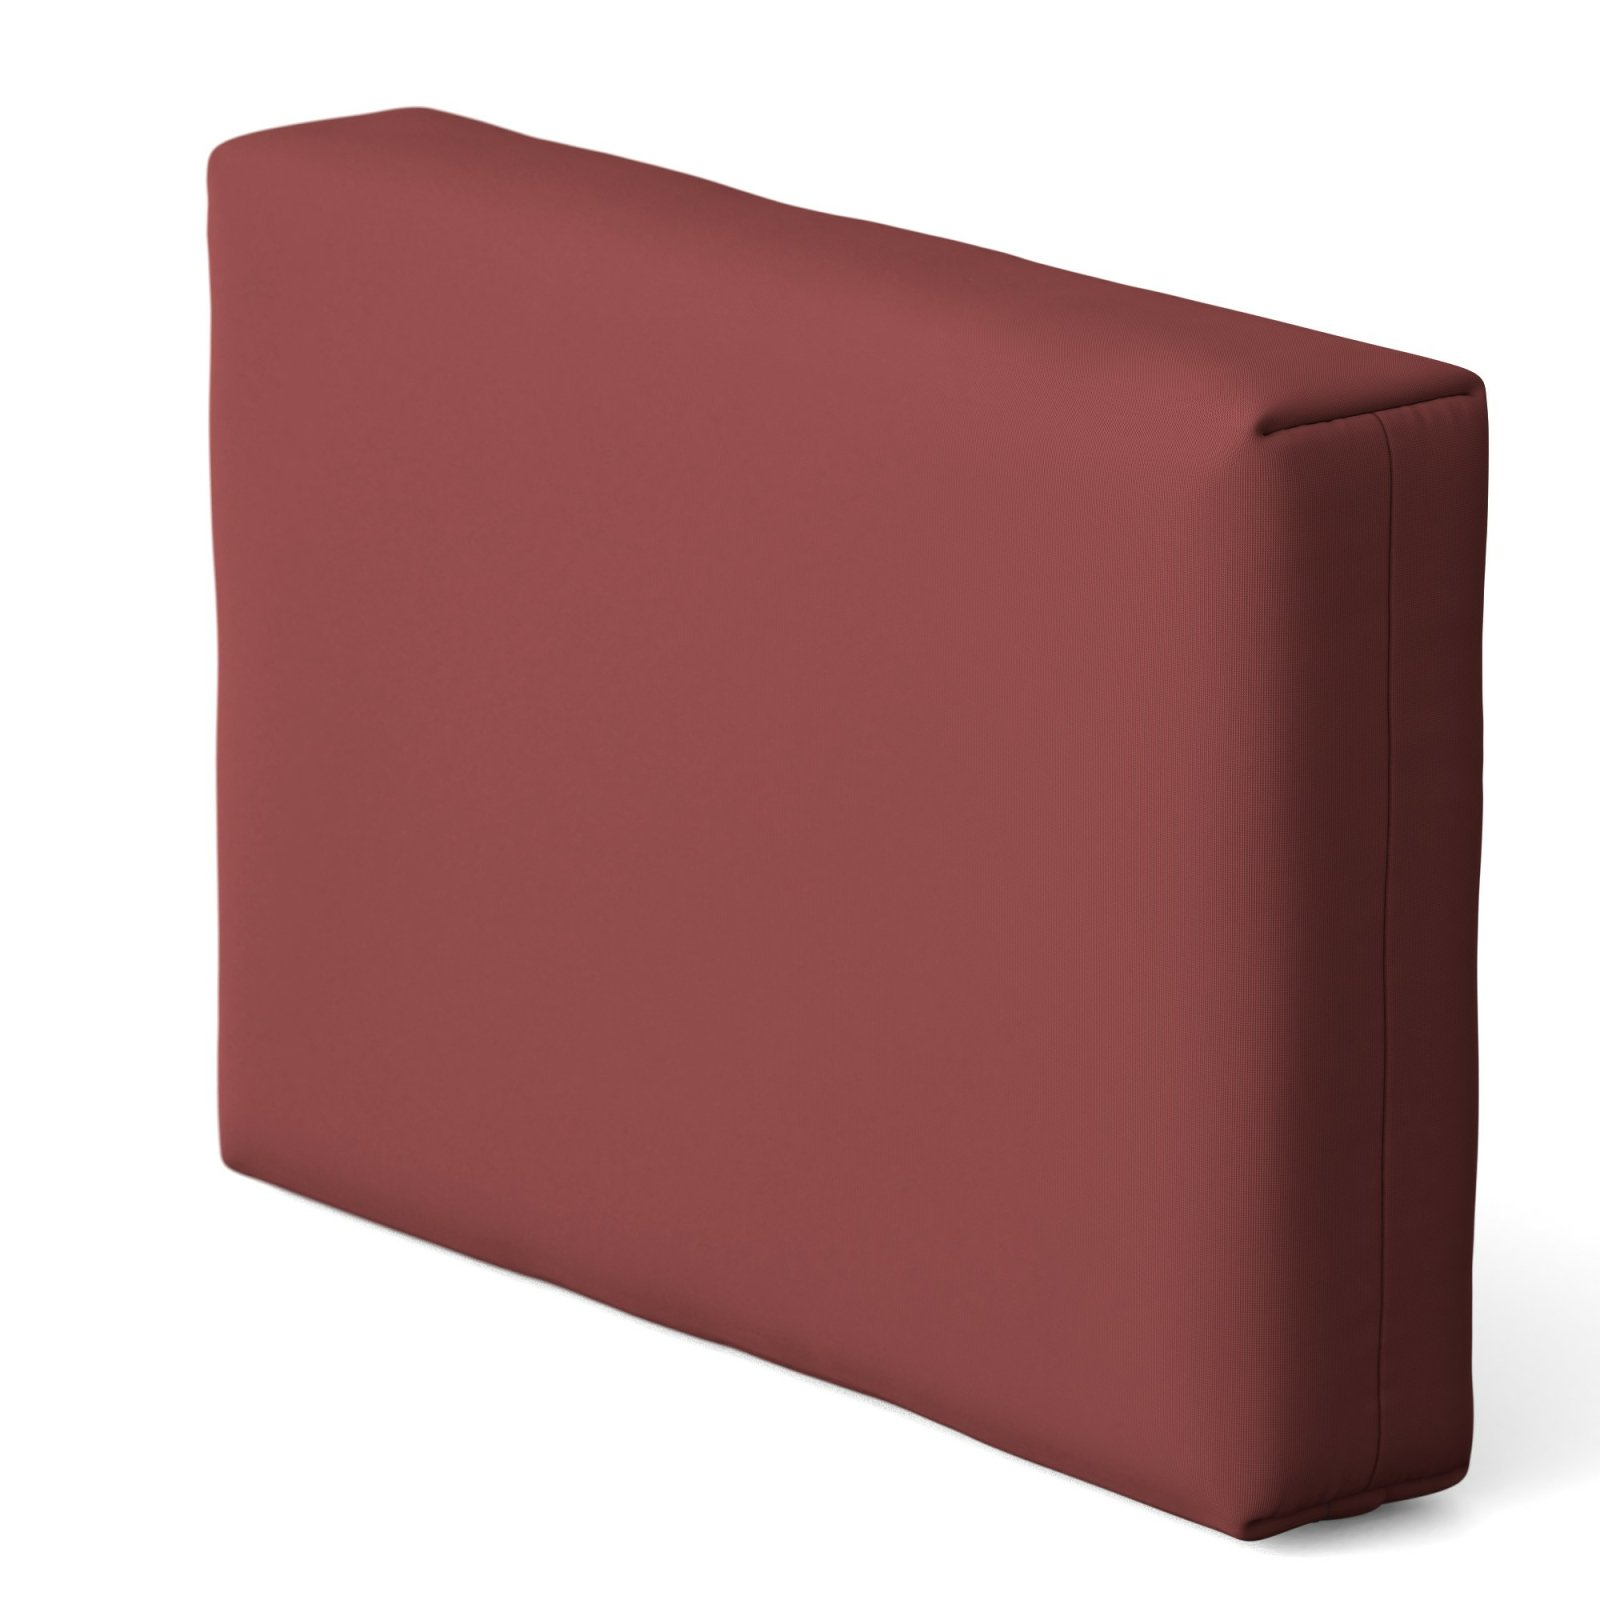 stunning lounge auflagen nach ma contemporary. Black Bedroom Furniture Sets. Home Design Ideas